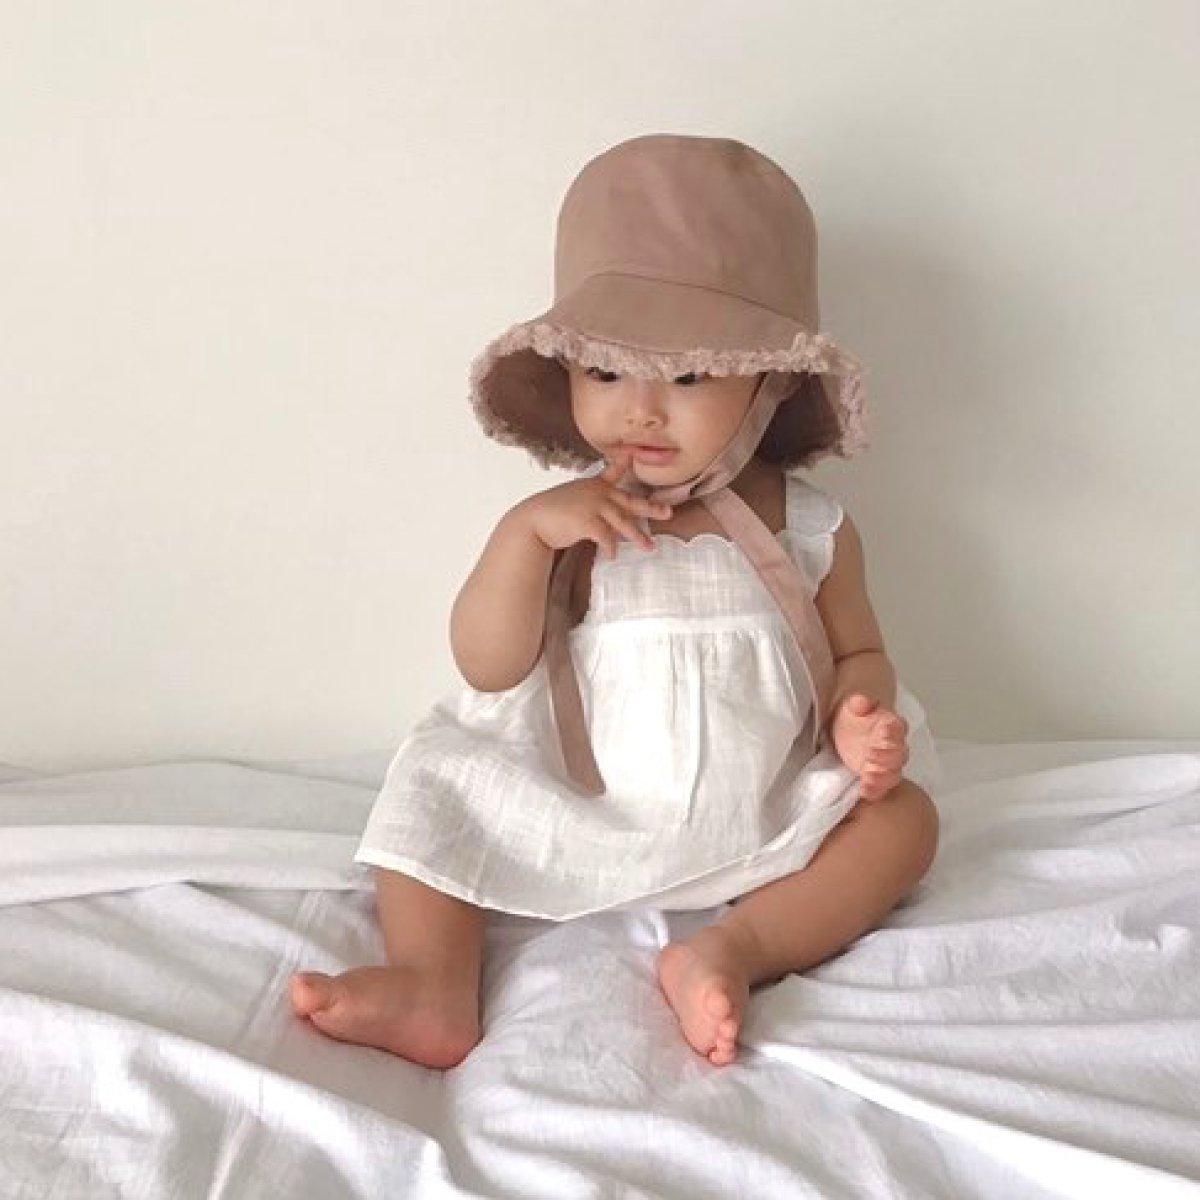 【BABY】Baby Fringe Hat 詳細画像28